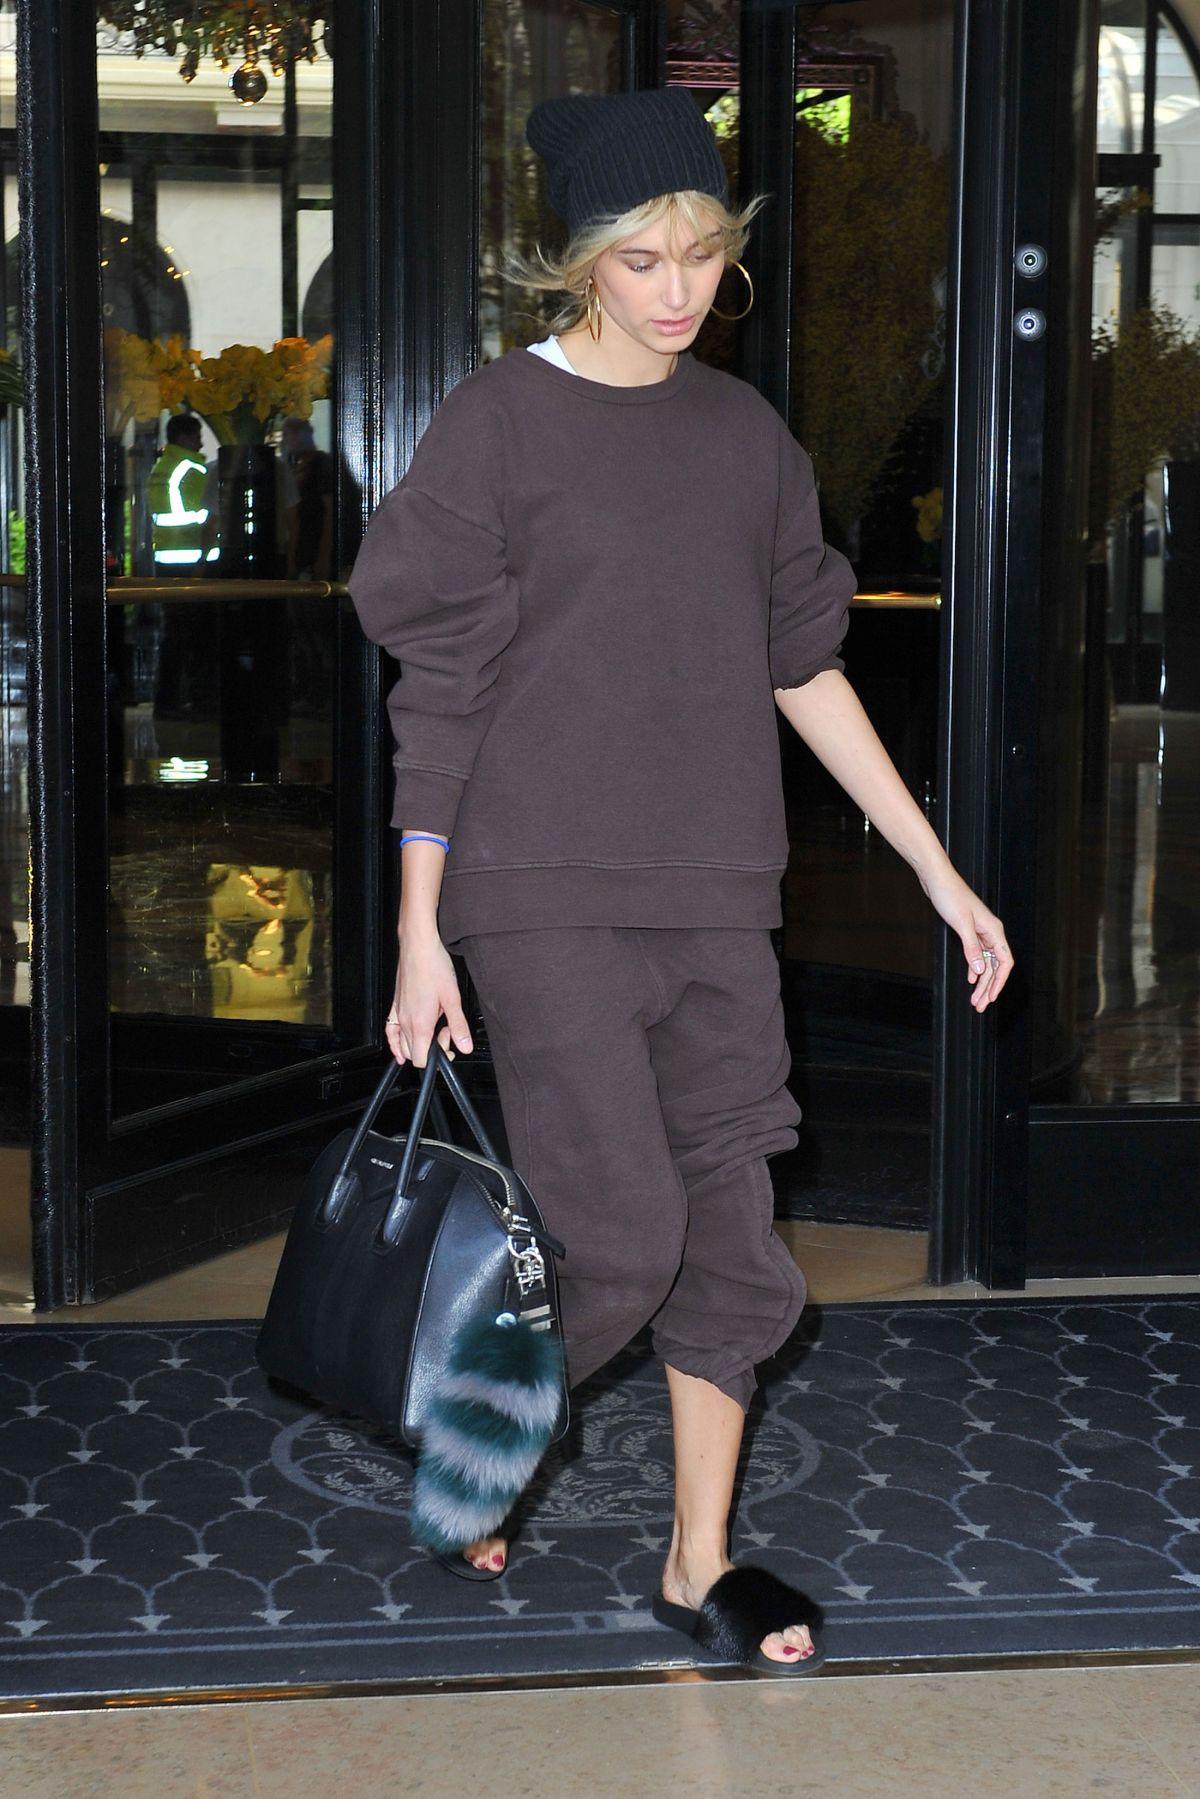 HAILEY BALDWIN leaves Her Hotel in paris 03/27/2017